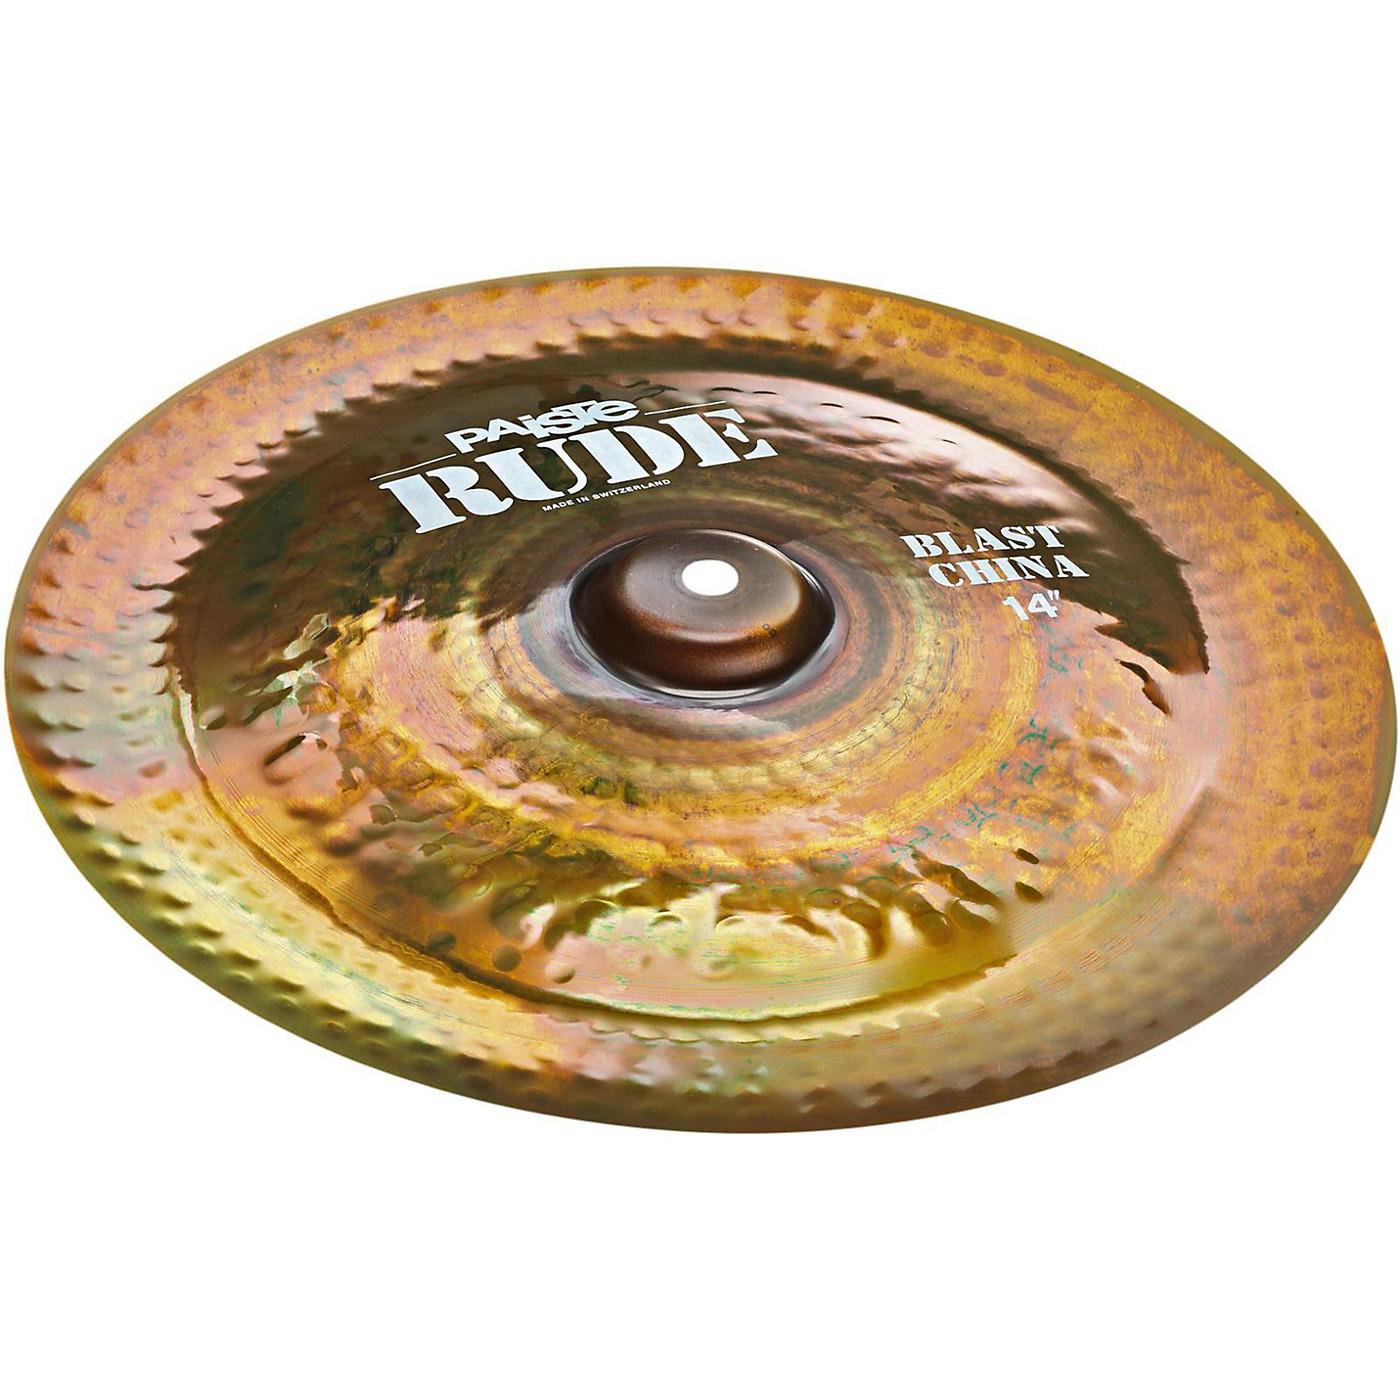 Paiste Rude Blast China Cymbal thumbnail